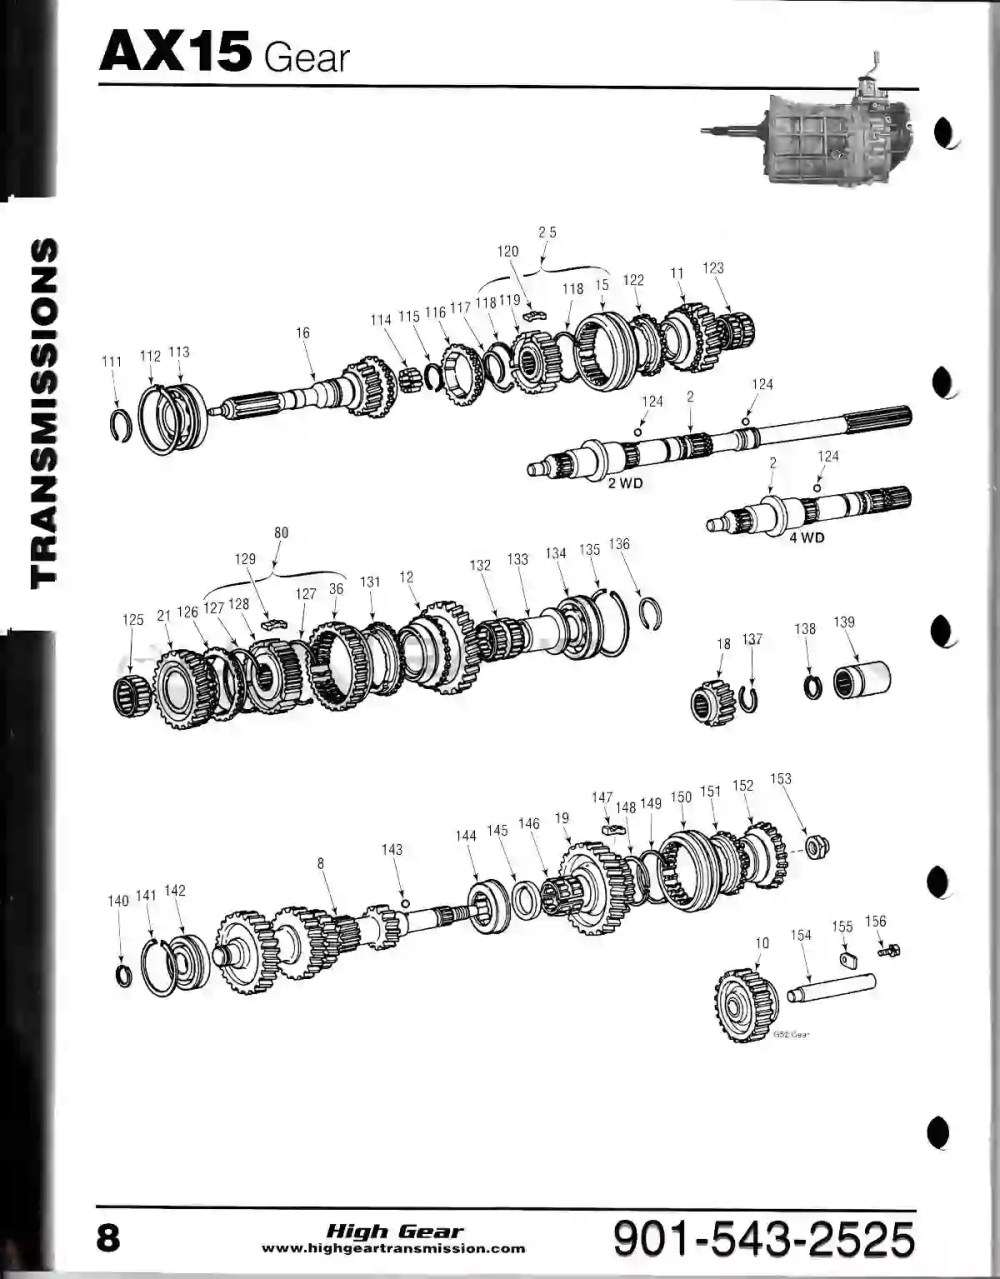 medium resolution of ax15 transmission diagram wiring diagram post ax15 transmission parts ax15 transmission diagram